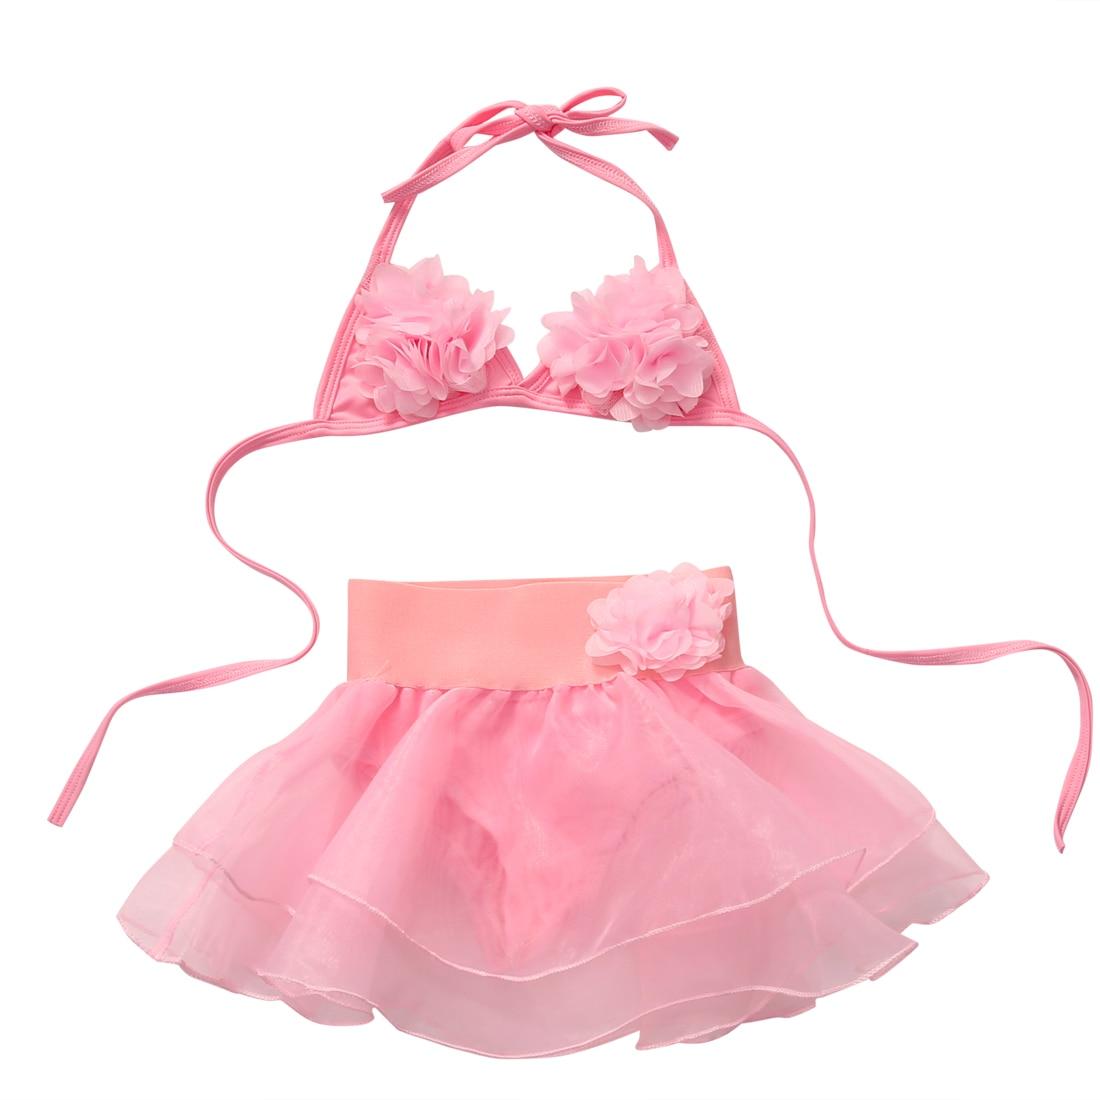 Black Friday Deals New 2017 Summer Kids Baby Girls Lace Pink Bikini Suit Set Swimsuit Swimwear Swimming Clothes